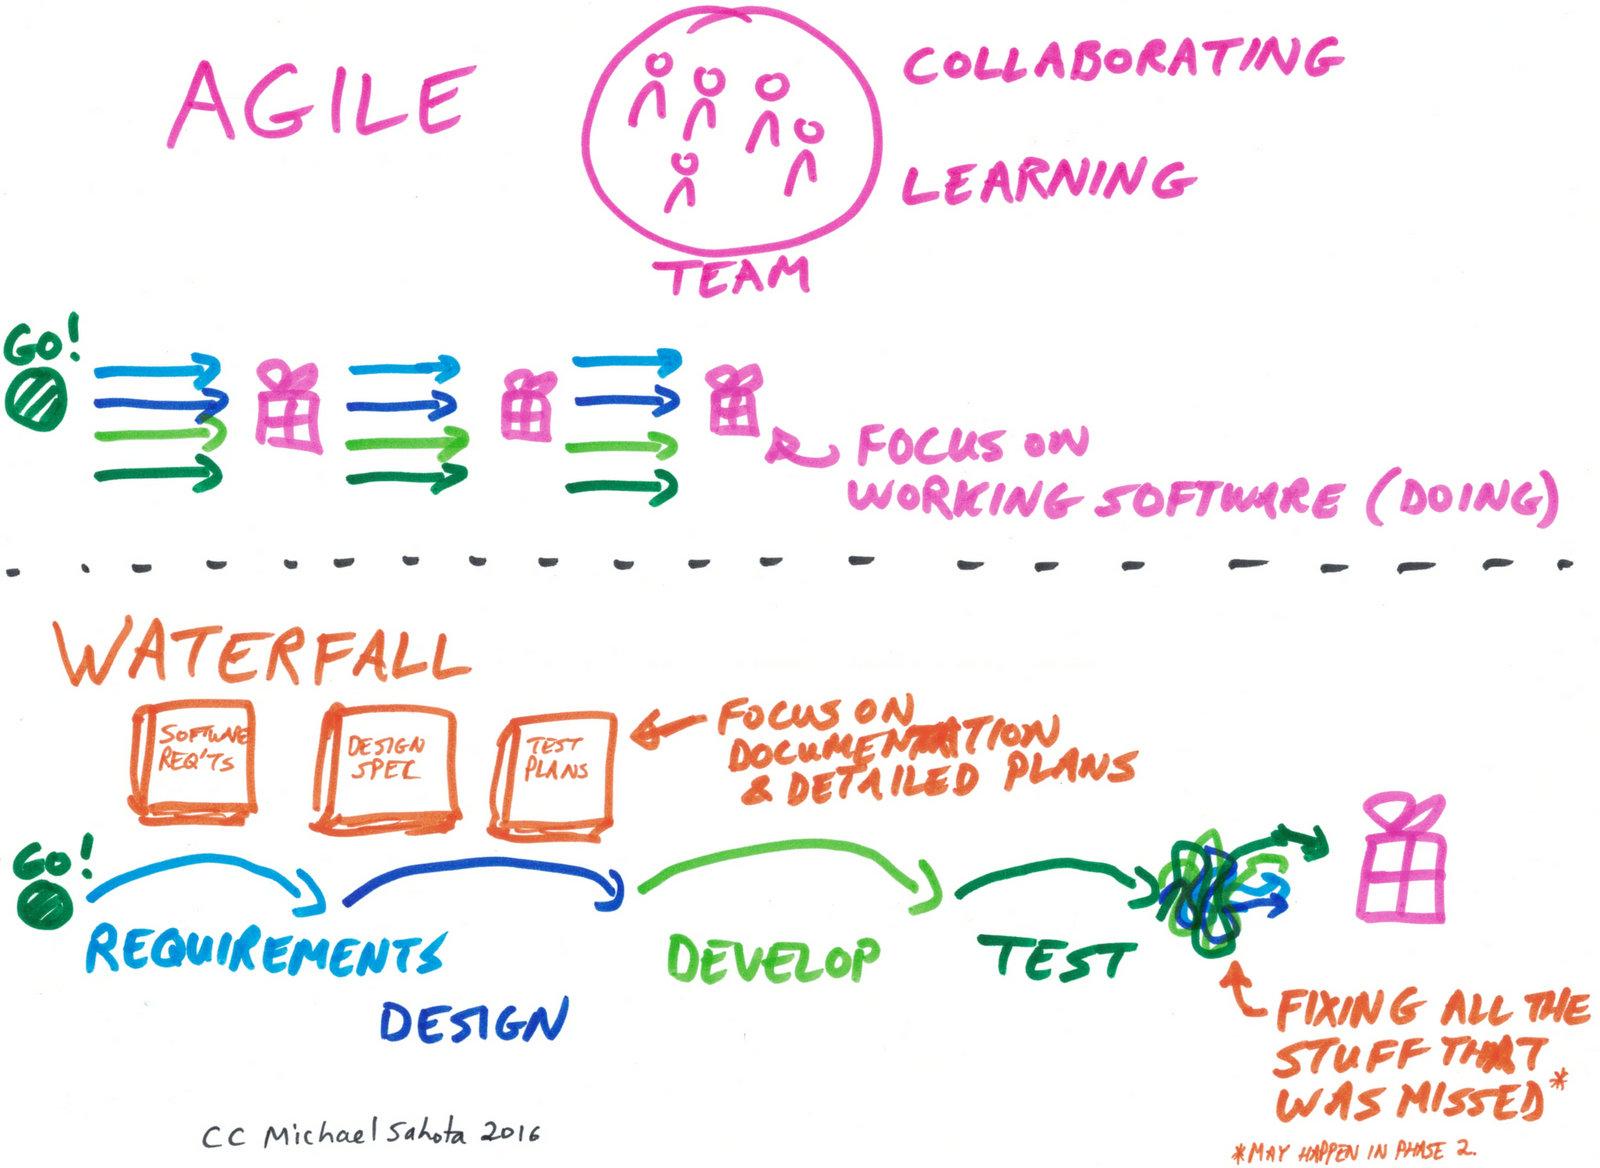 Agile & Waterfall Methodologies – A Side-By-Side Comparison